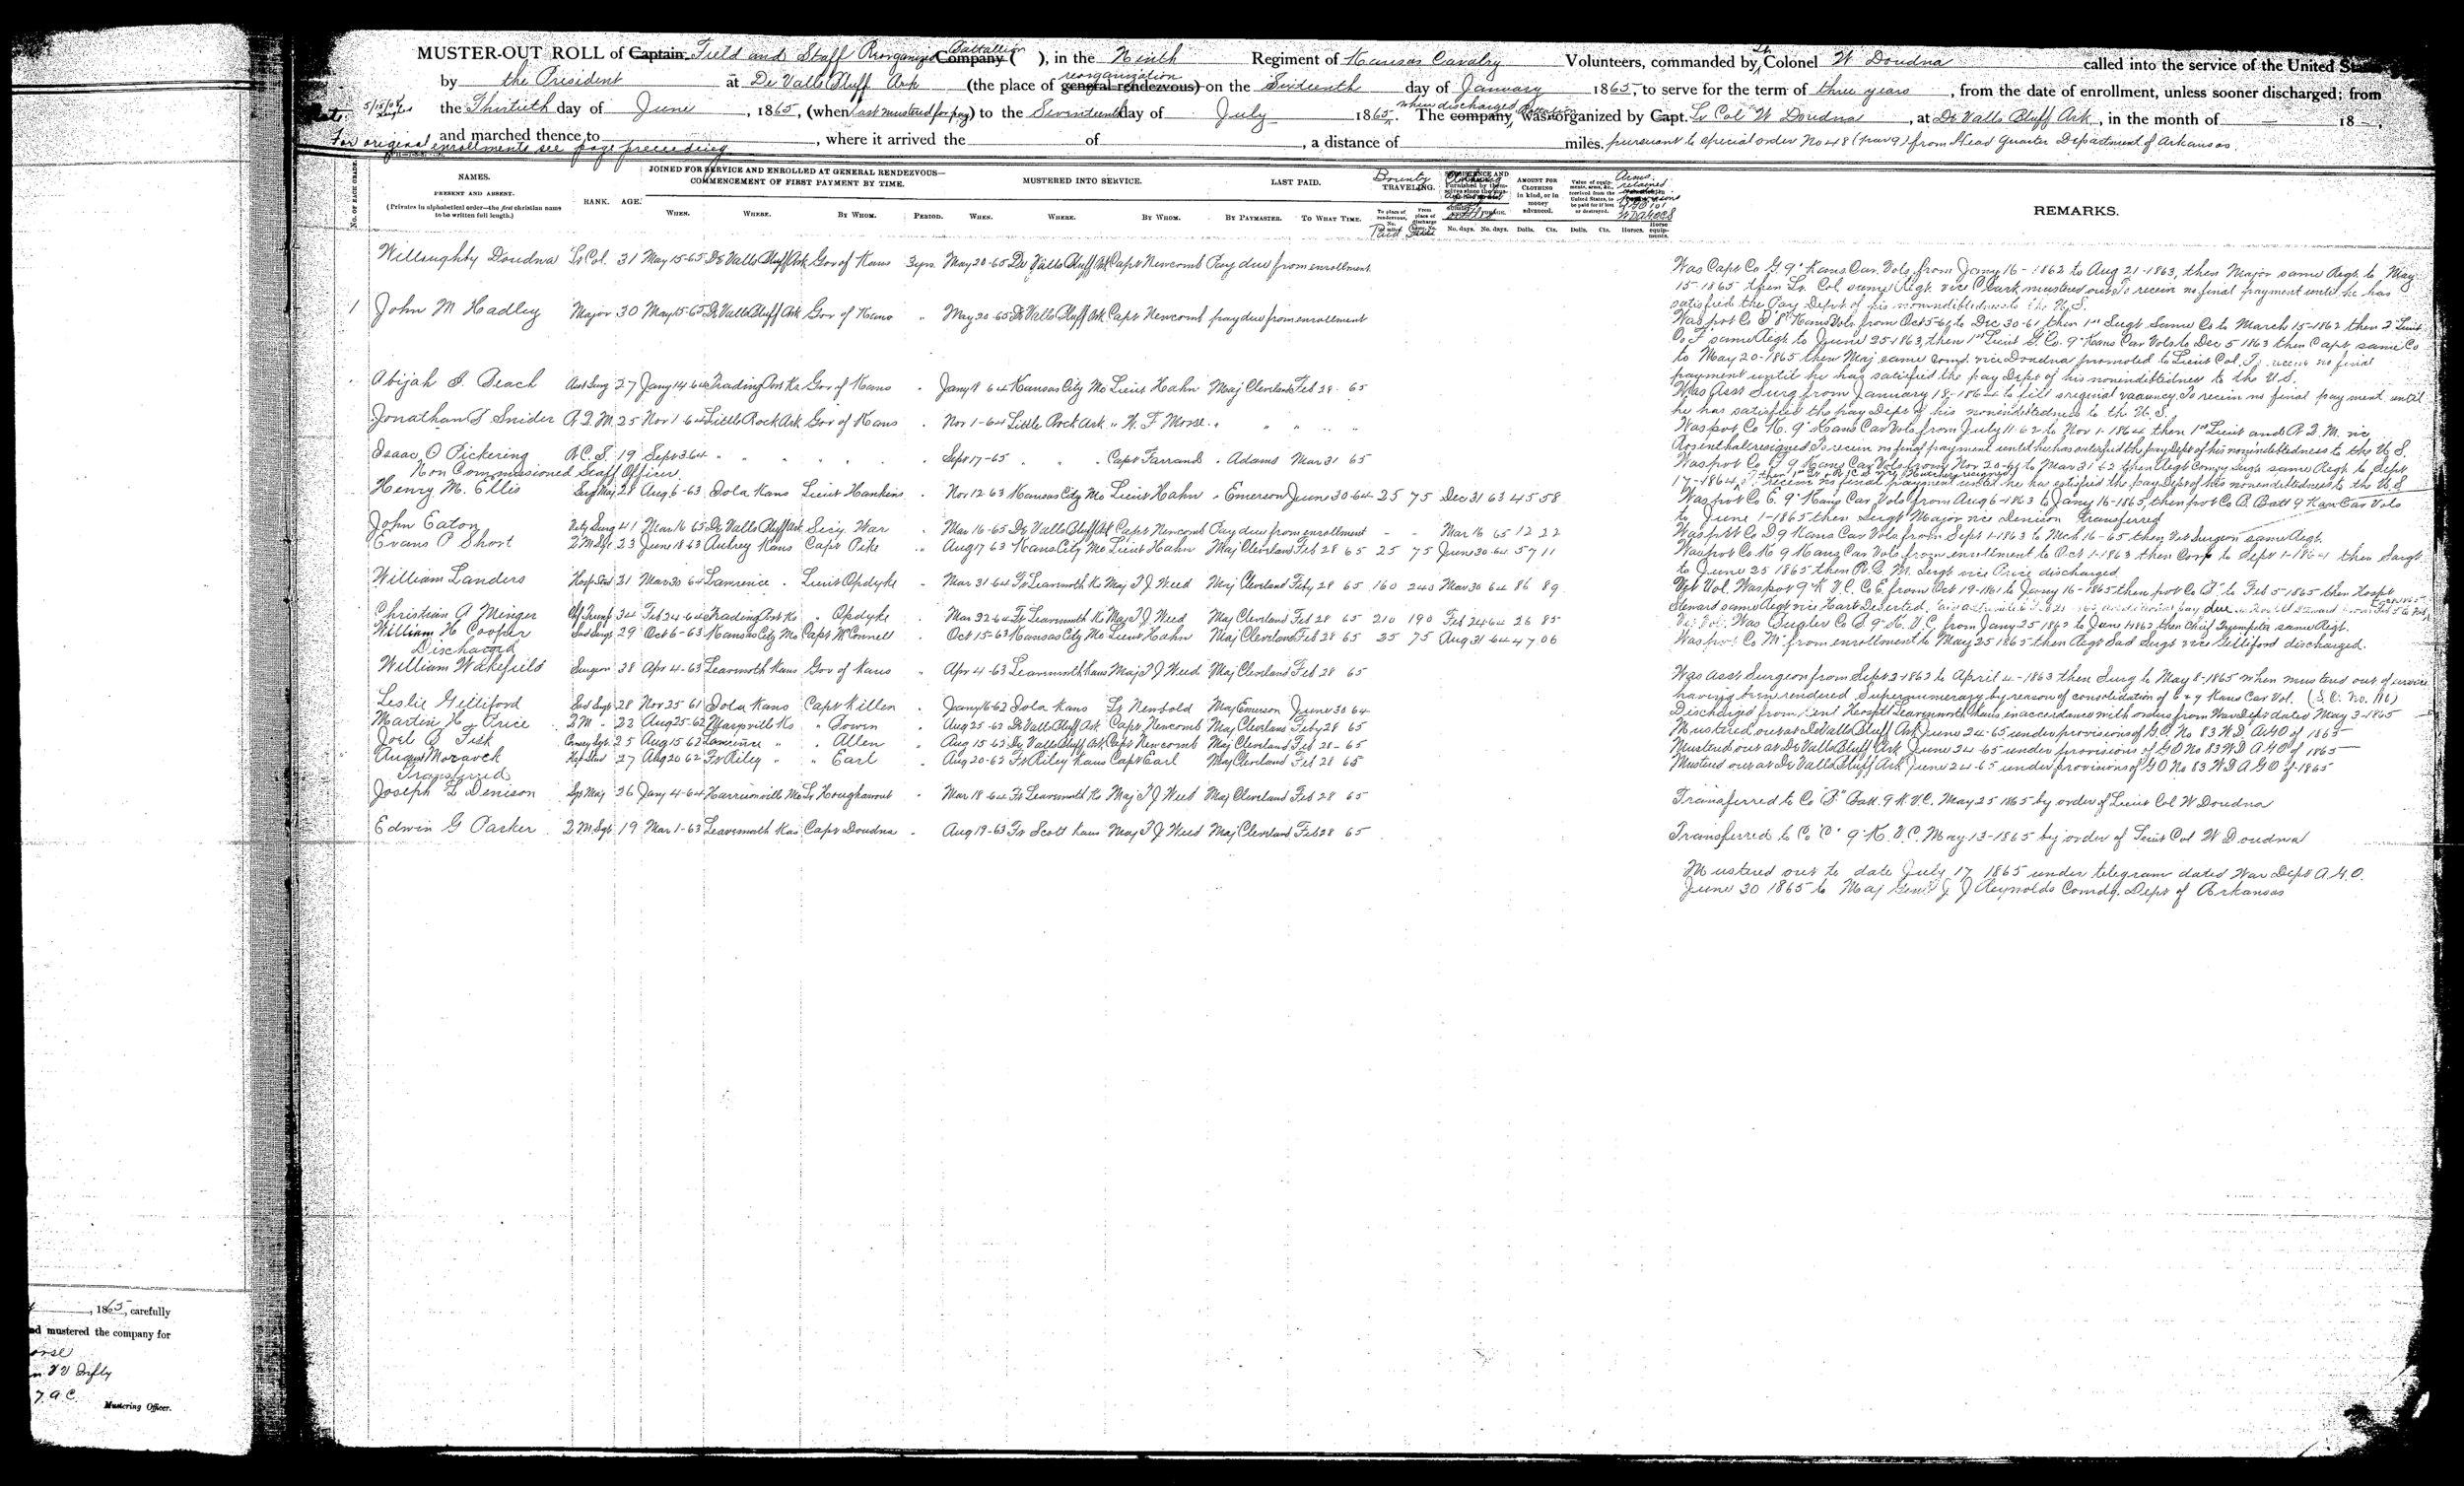 Muster out roll, Ninth Regiment, Cavalry, Kansas Civil War Volunteers regiment, volume 3 - 4